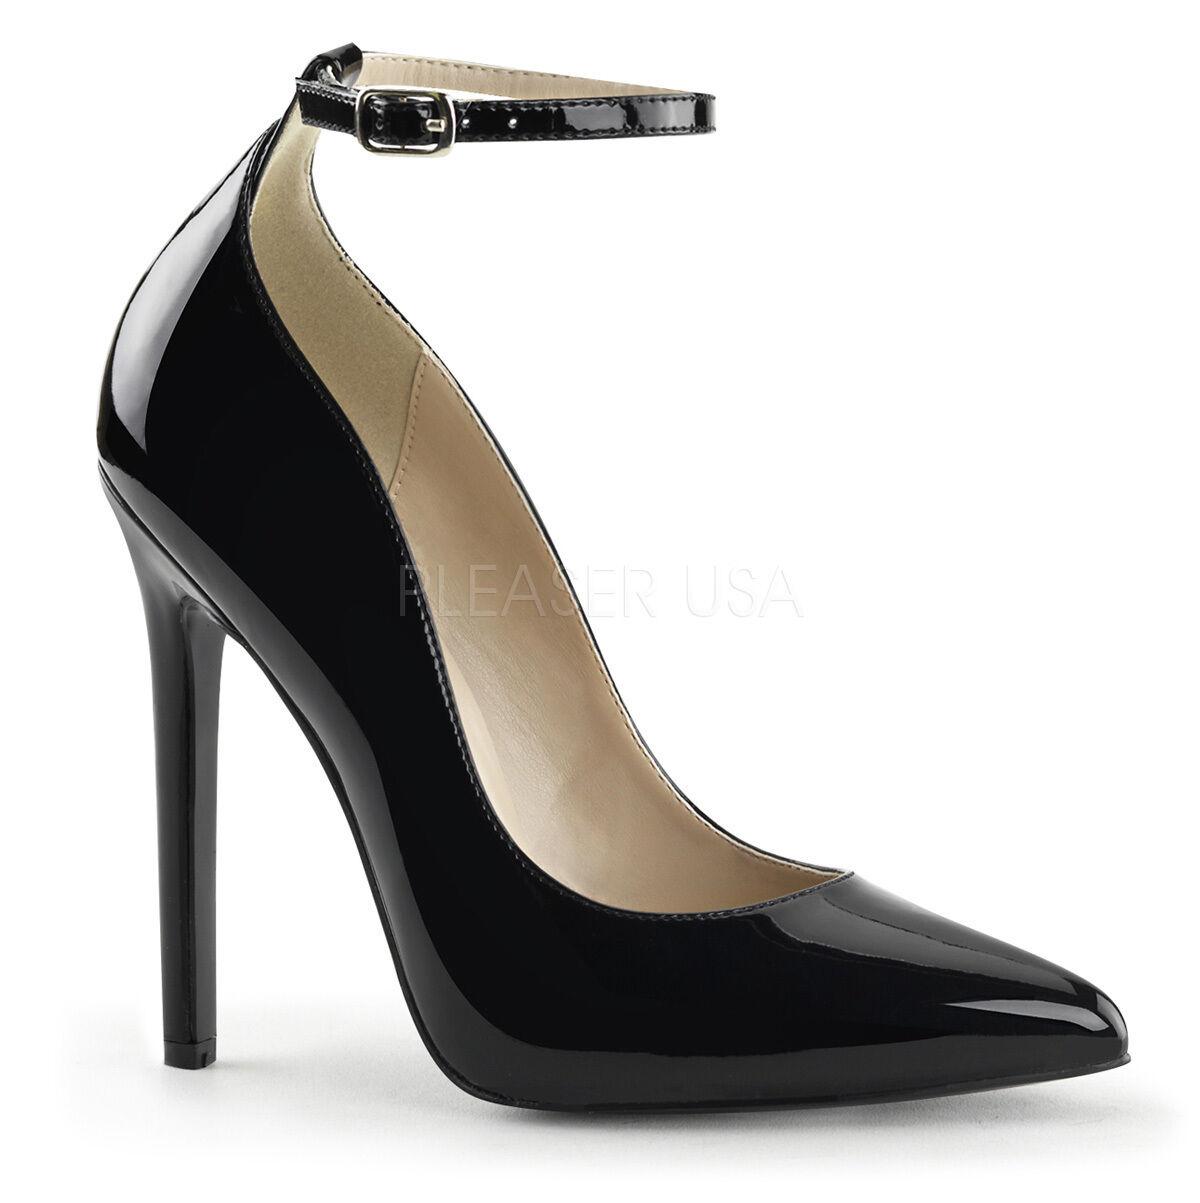 PLEASER 5-5 1/4 SEXY 23 HIGH HEEL STILETTO ANKLE ANKLE STILETTO STRAP COURT Schuhe SIZES 3-11 f666a7